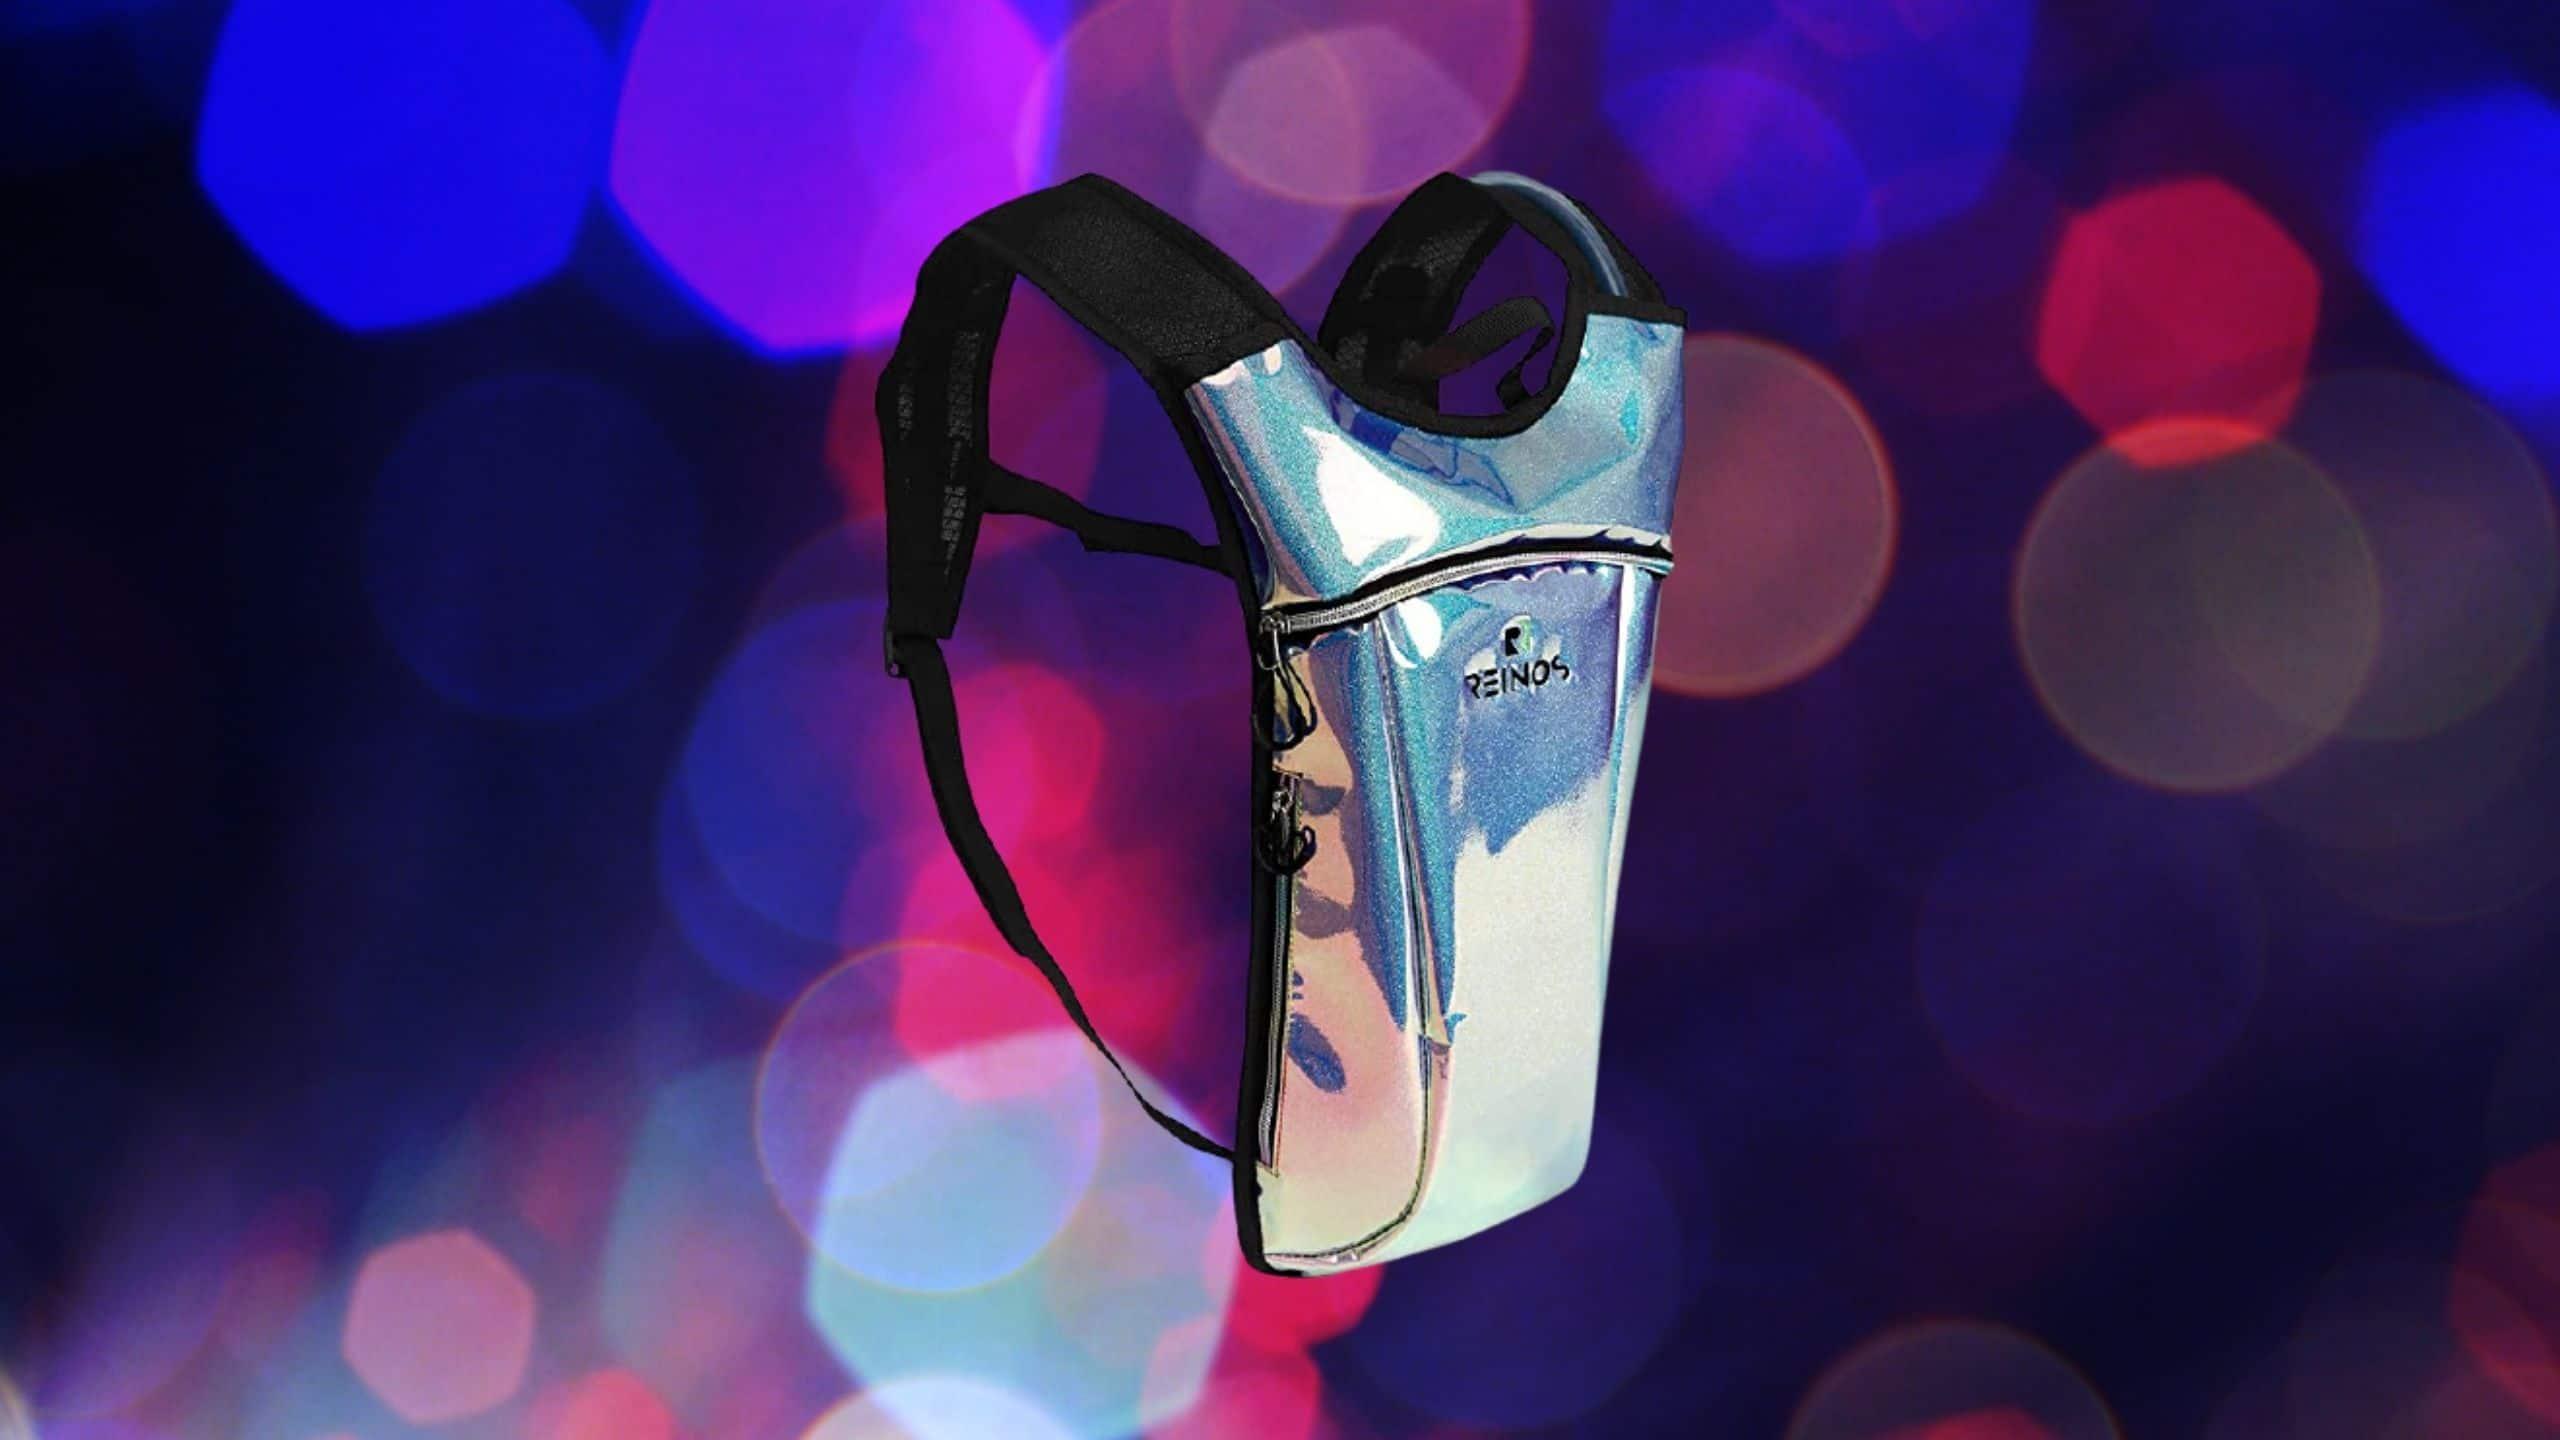 REINOS' Multi-purpose Hydration Backpack